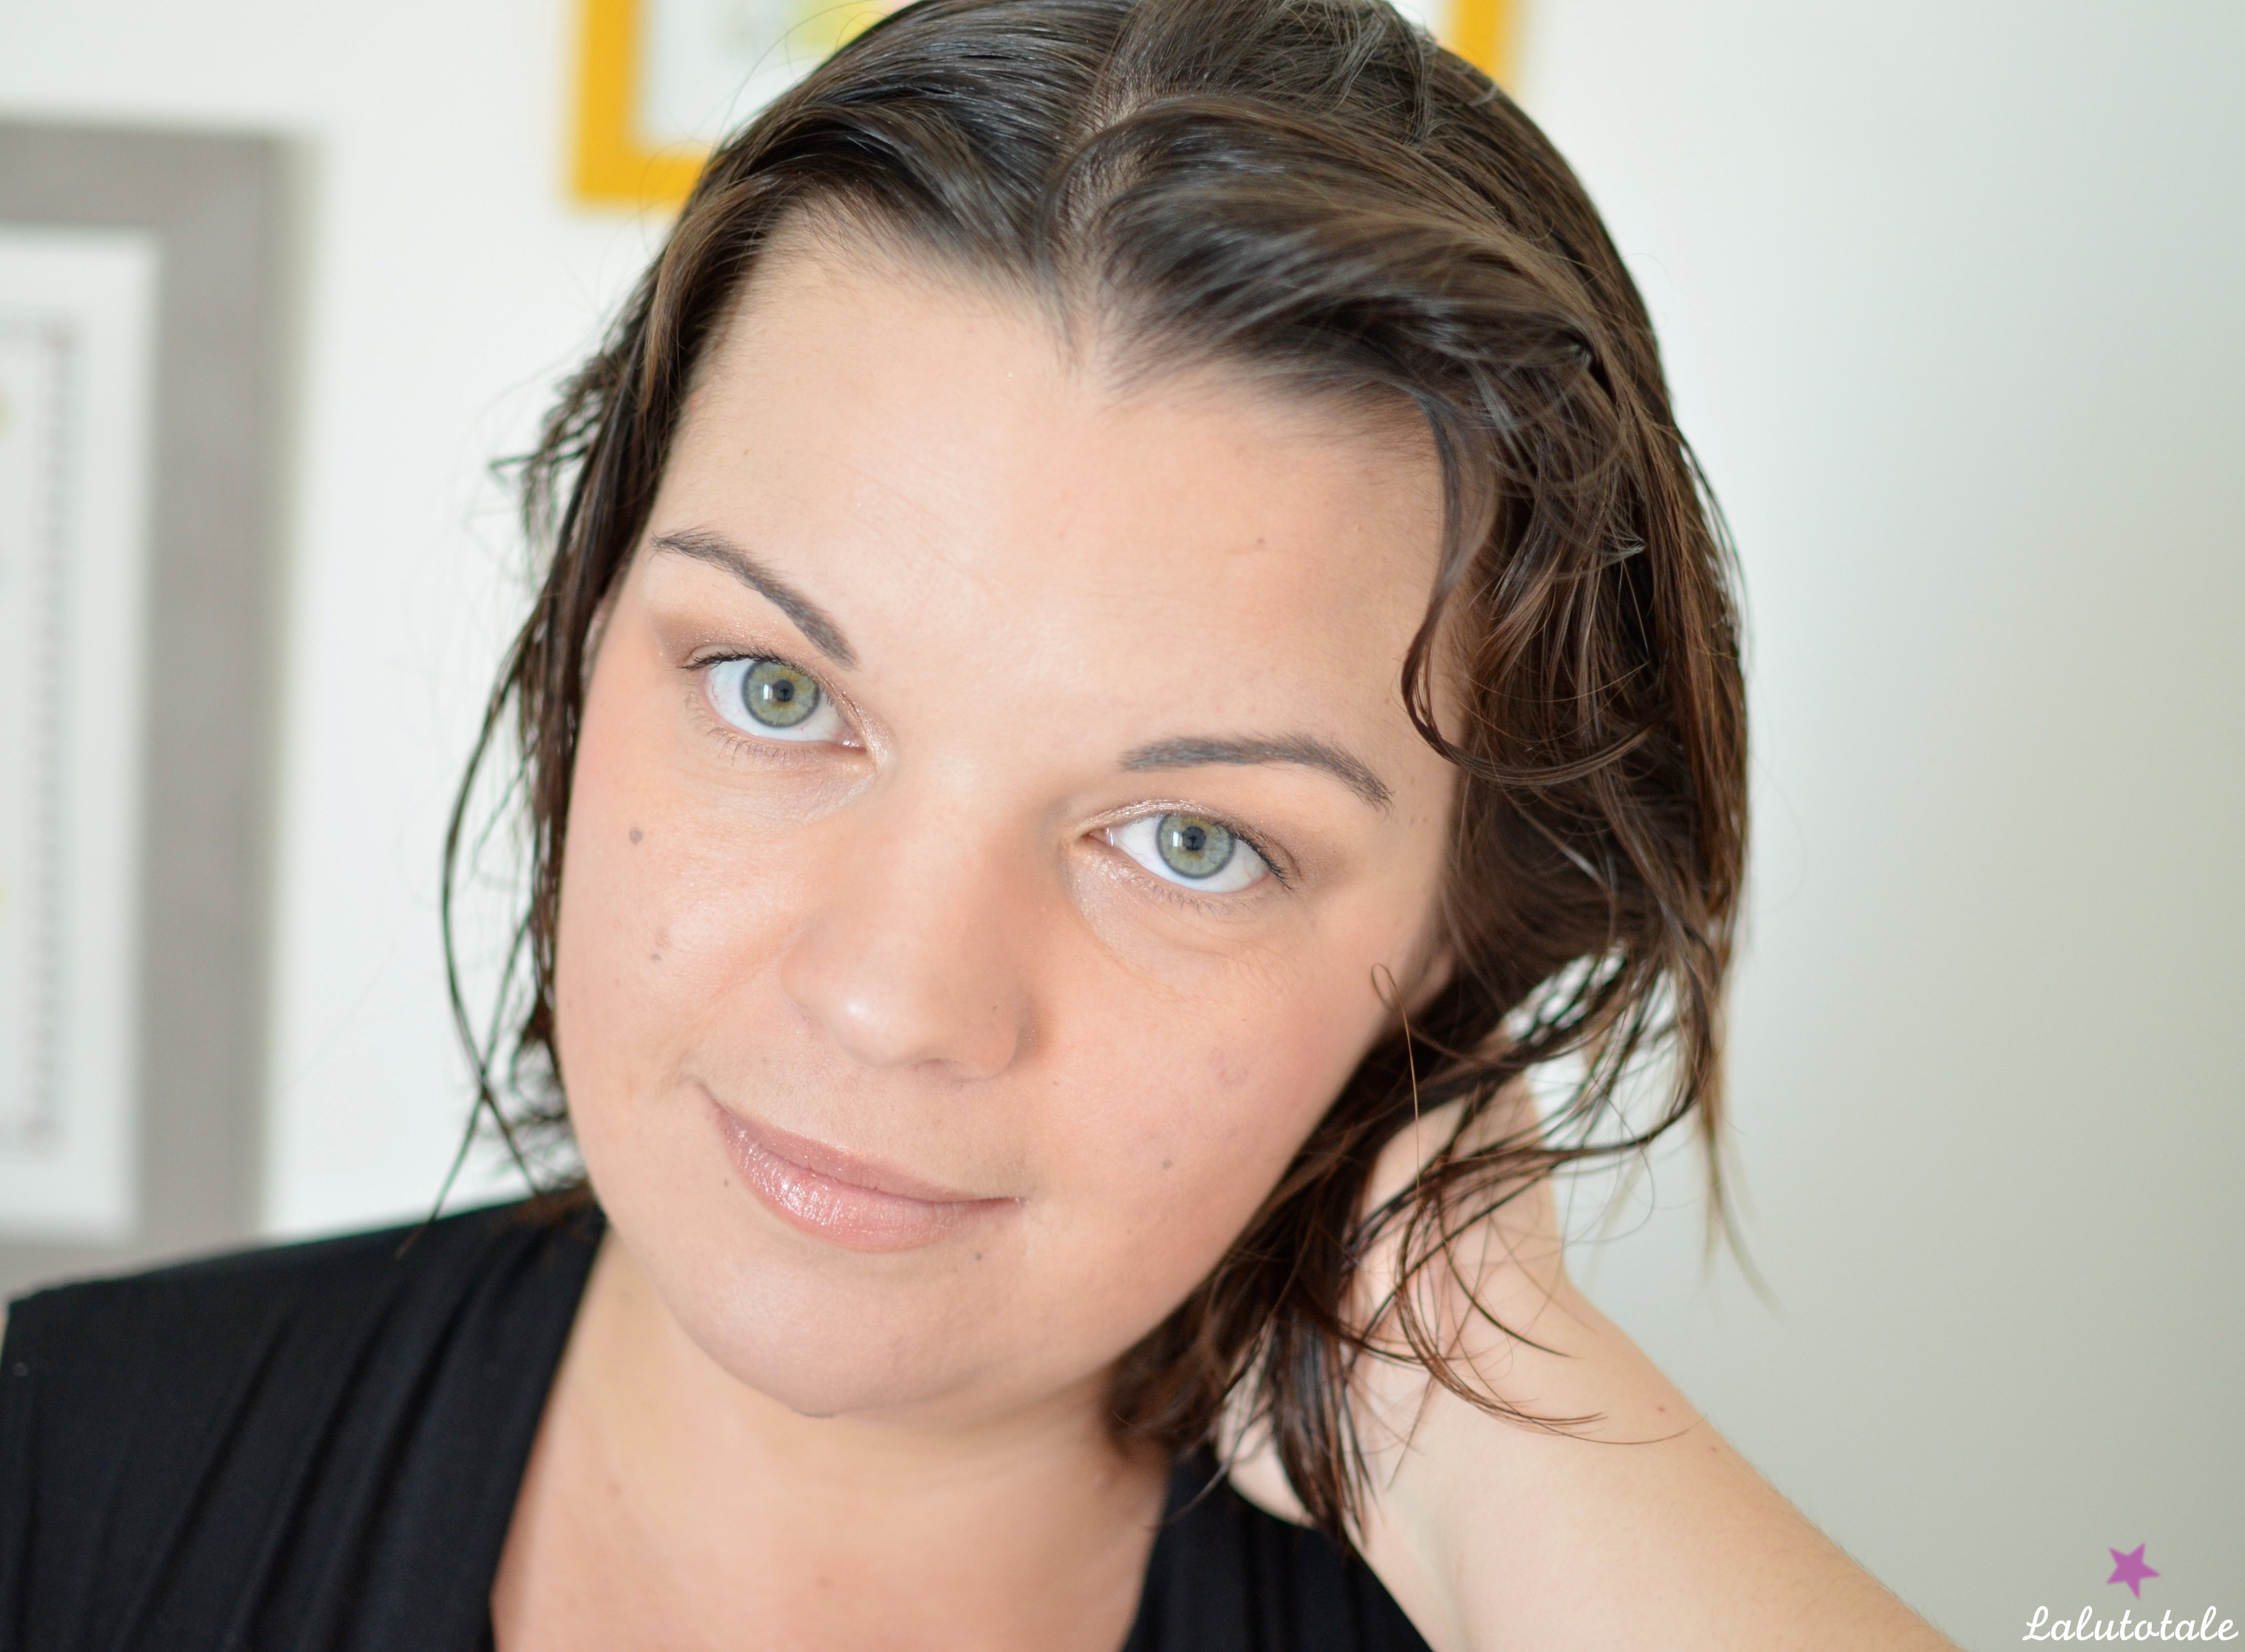 comment faire un maquillage nude beautiful crdits photo with comment faire un maquillage nude. Black Bedroom Furniture Sets. Home Design Ideas